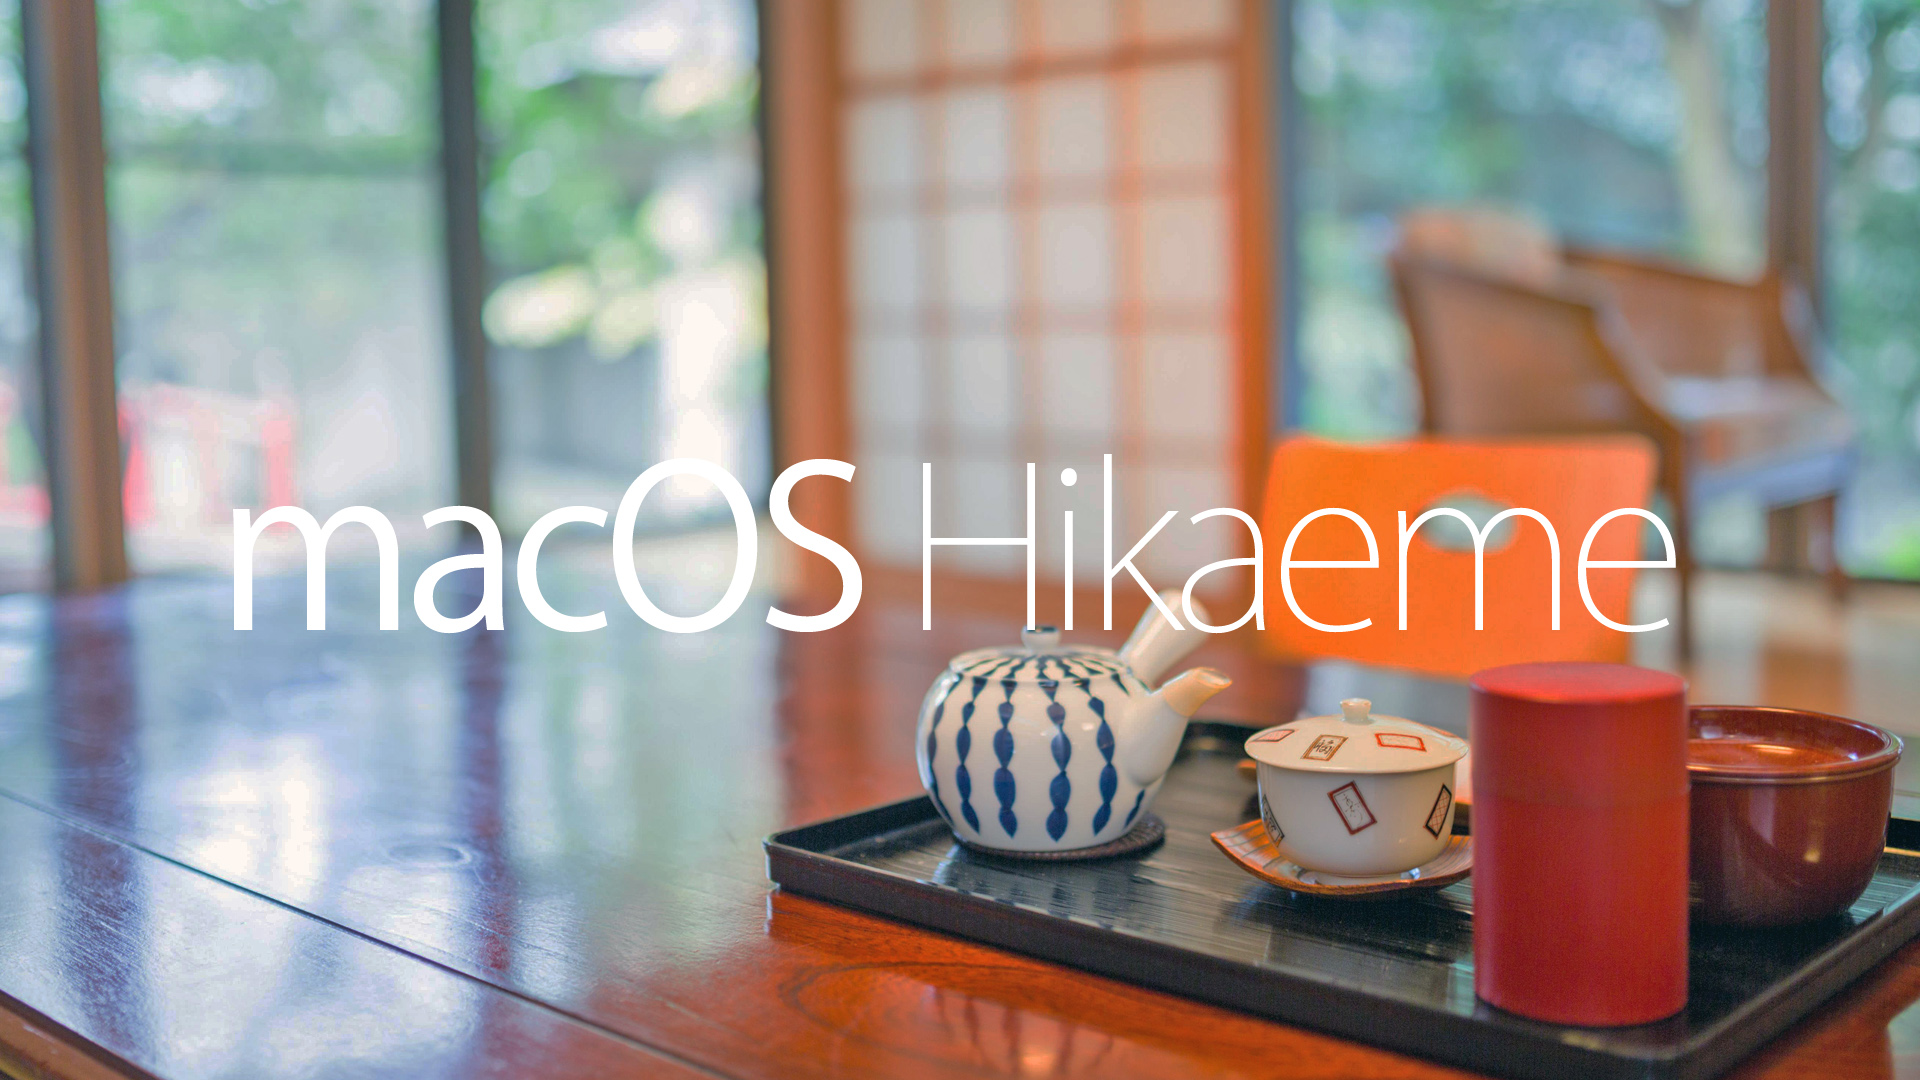 Mac OS Hikaeme